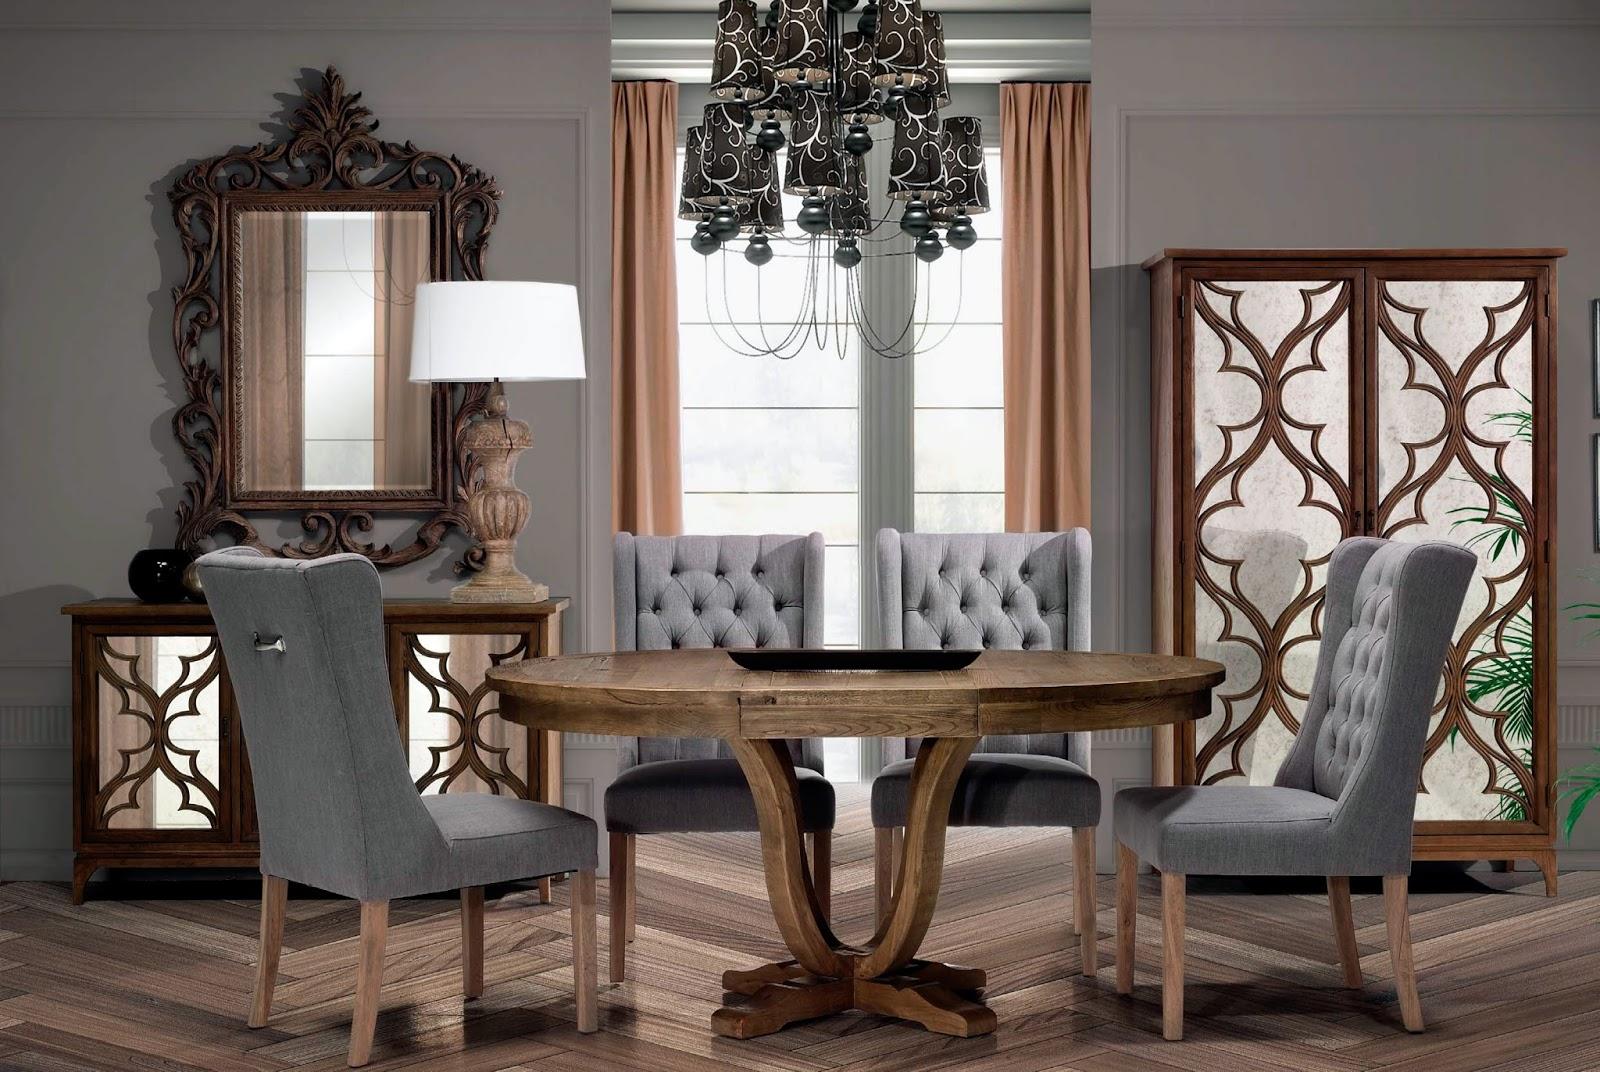 Muebles de comedor 10 comedores con vitrina for Comedores modernos de madera 2016